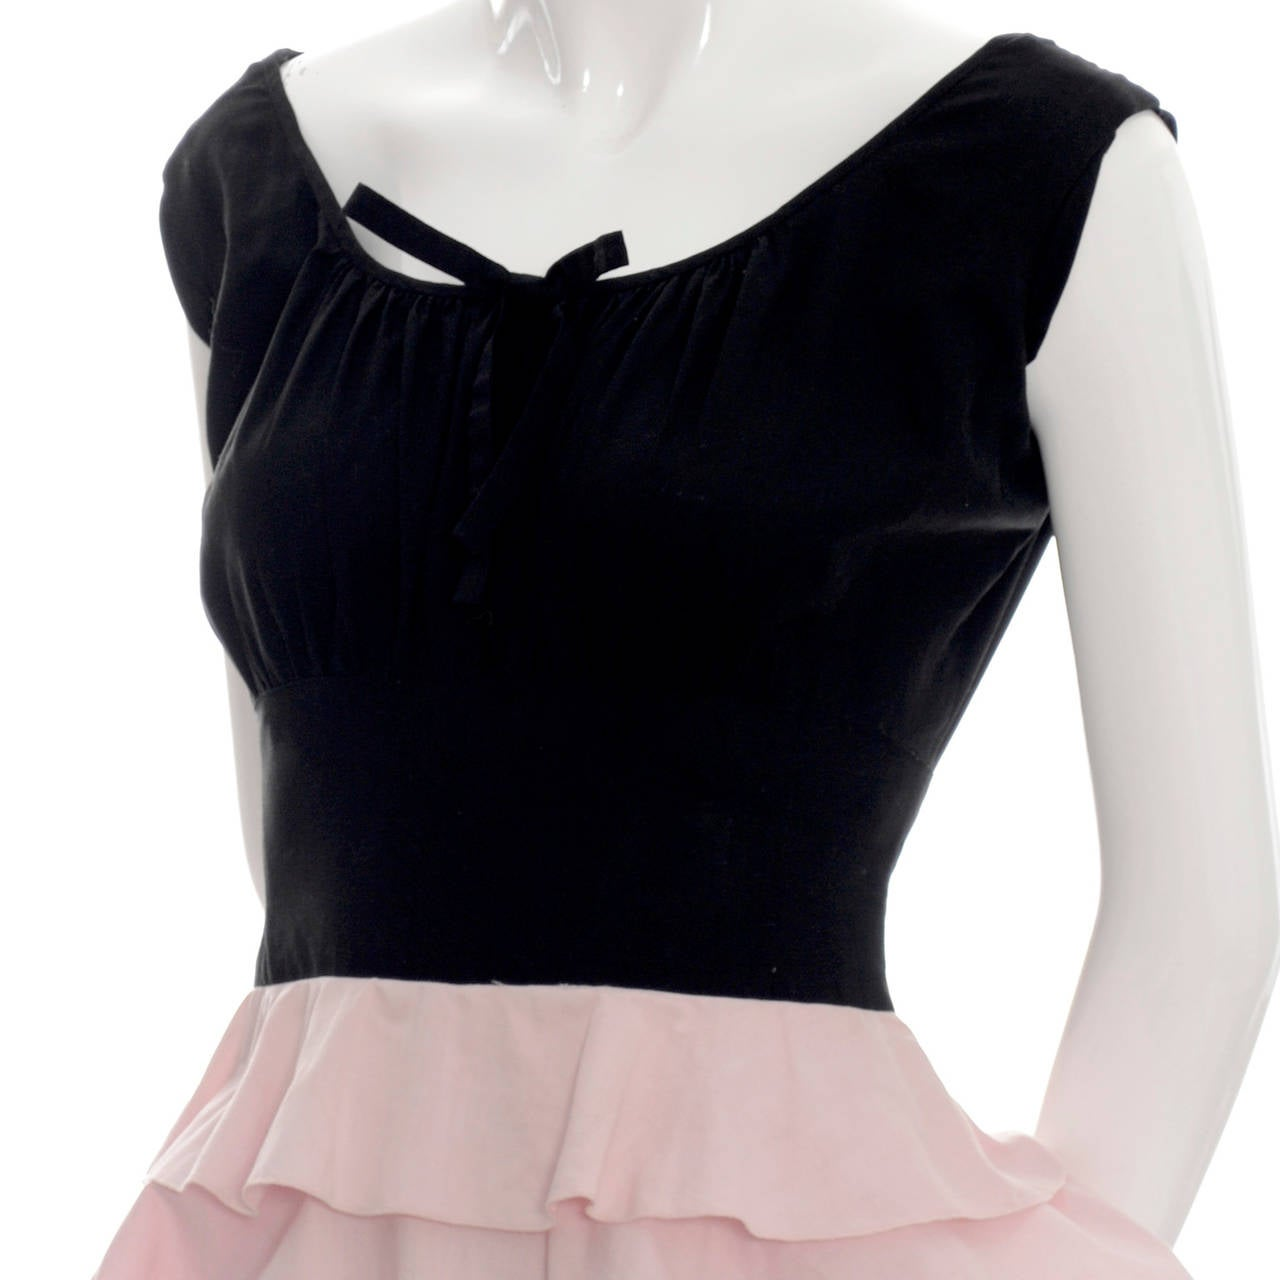 1940s Vintage Gilbert Adrian Original Dress Pink Ruffles Rare Designer Gown 4